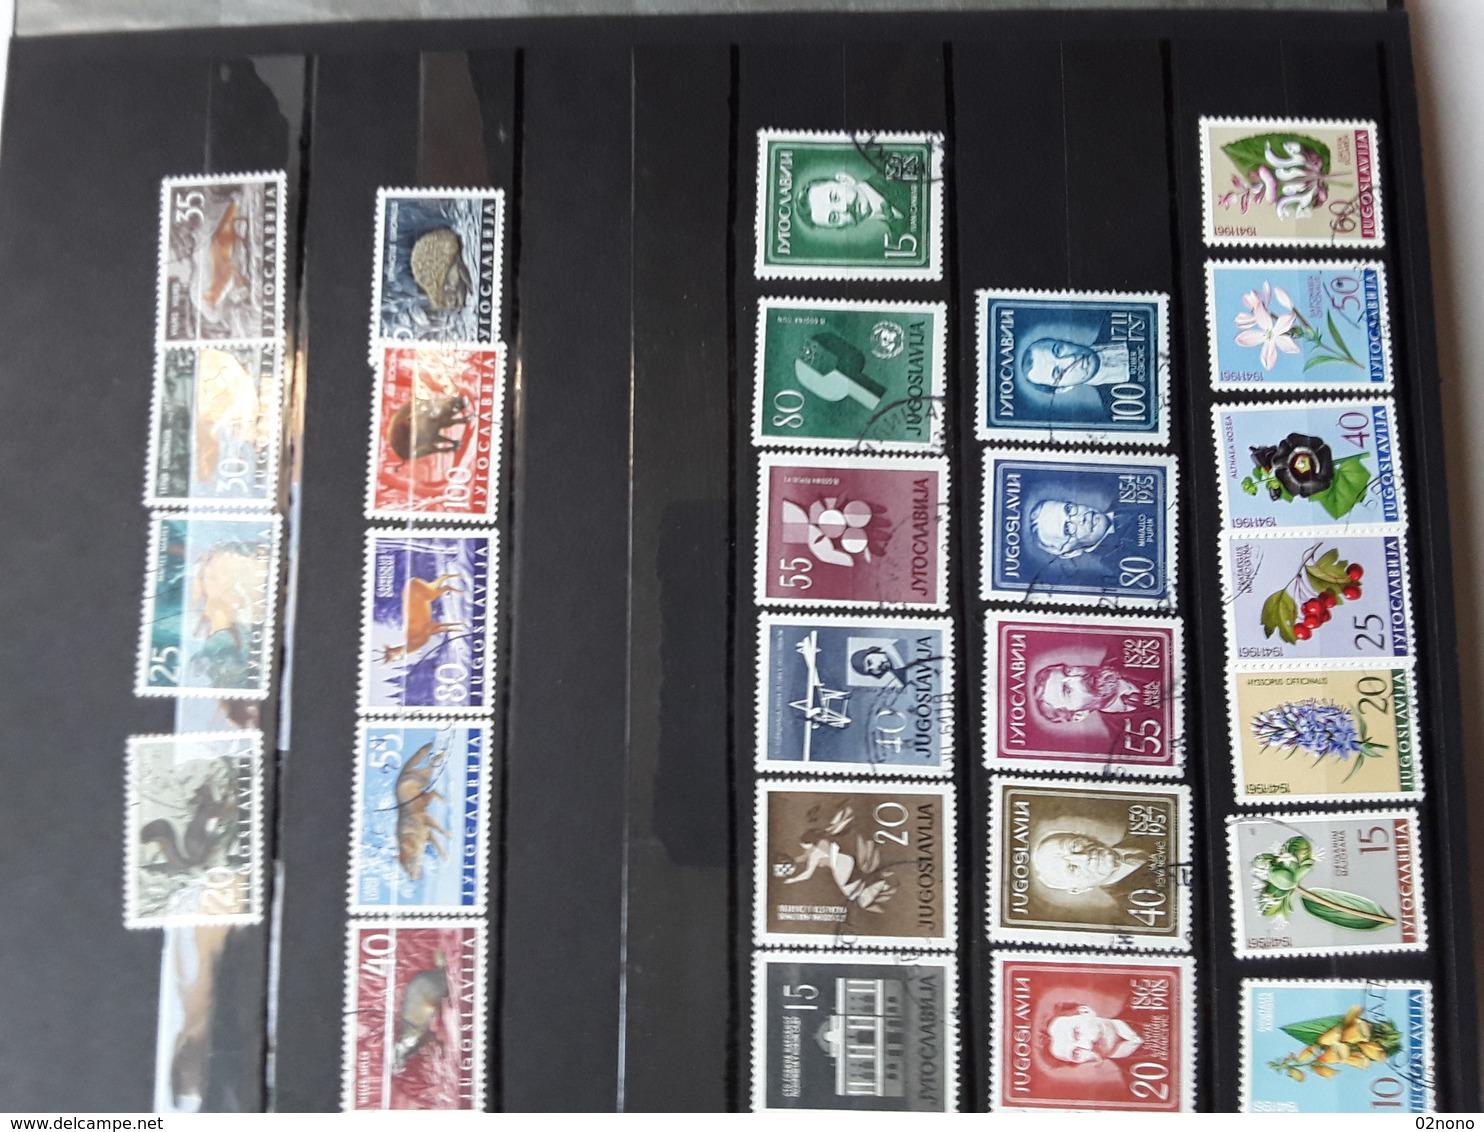 Yougoslavie, Irlande - Lots & Serien